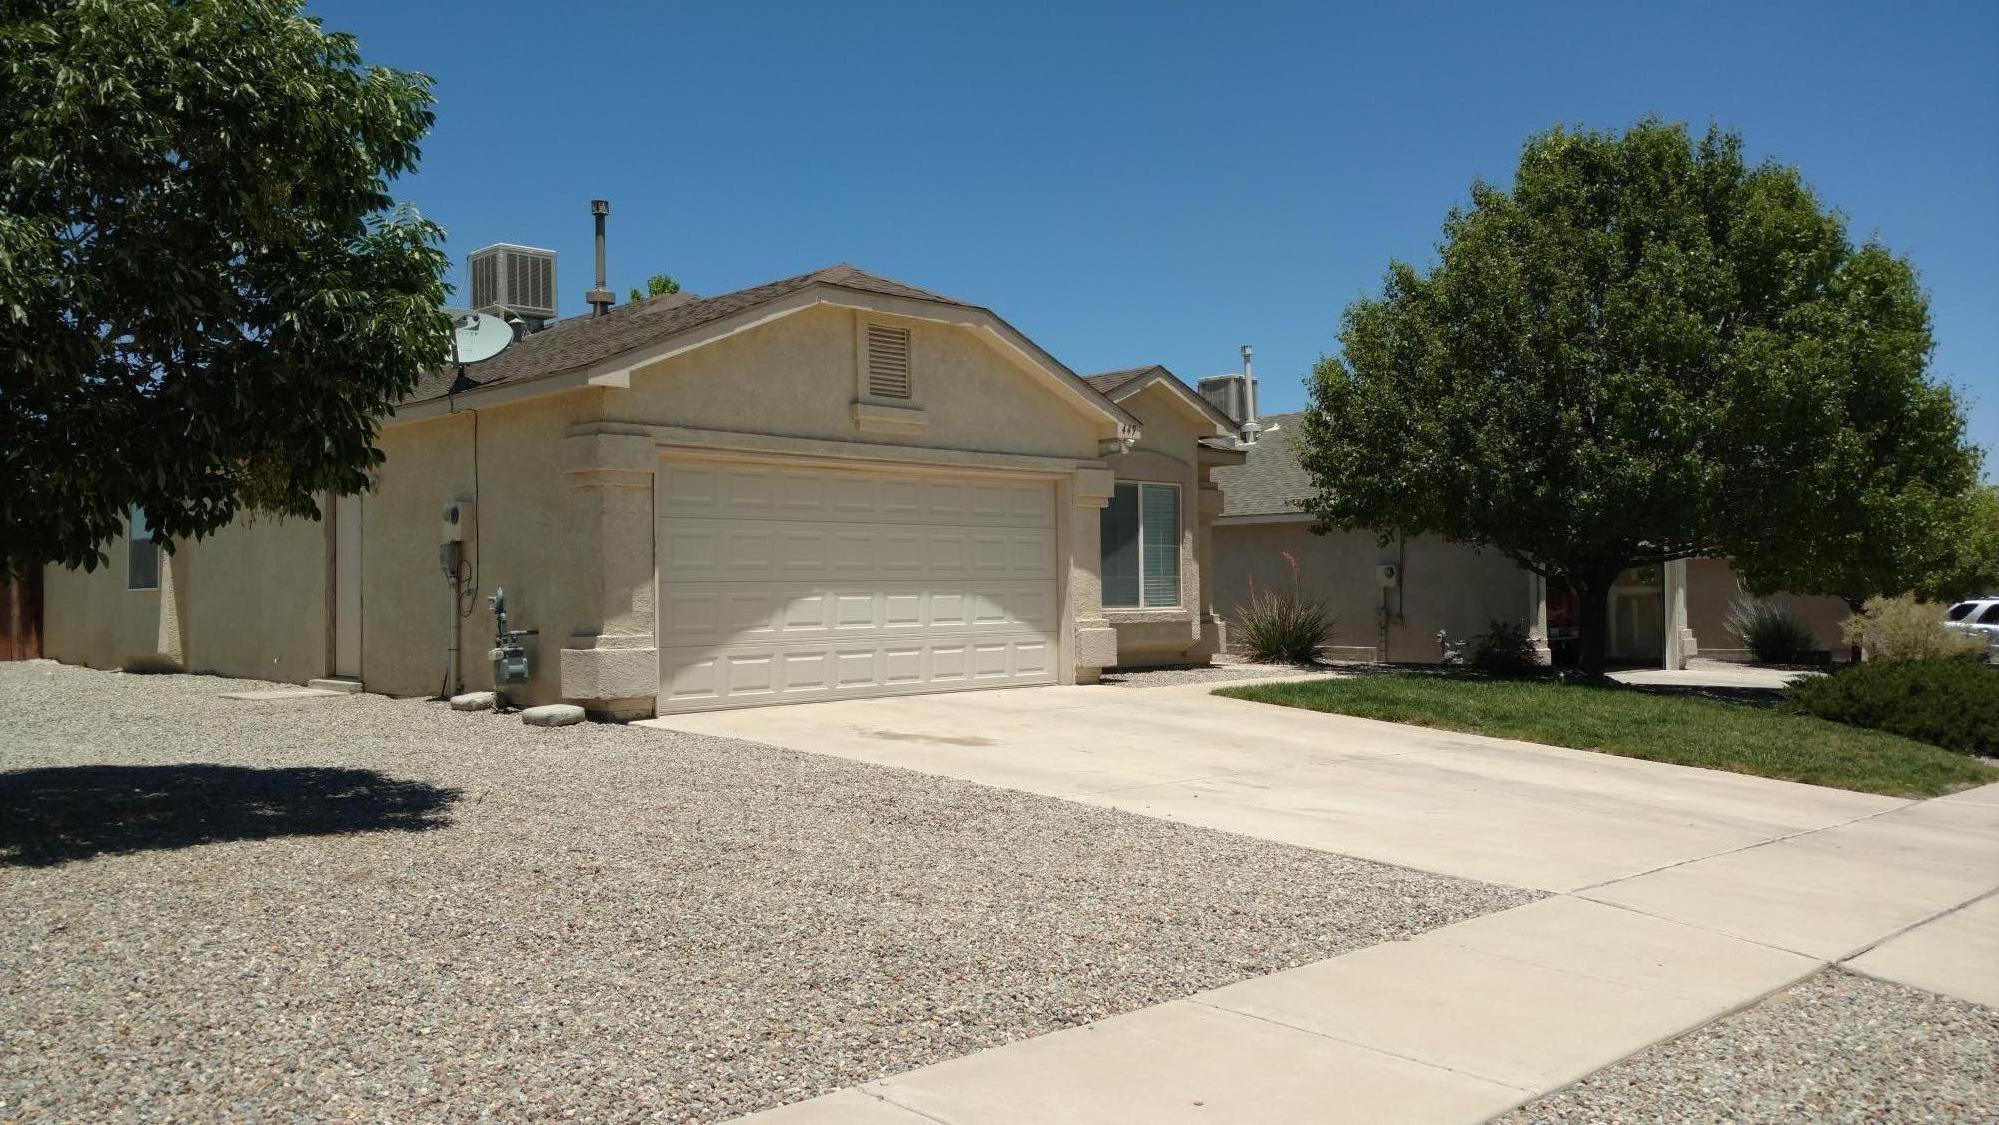 449 Chadron Meadows Street NW, Rio Rancho, NM 87124